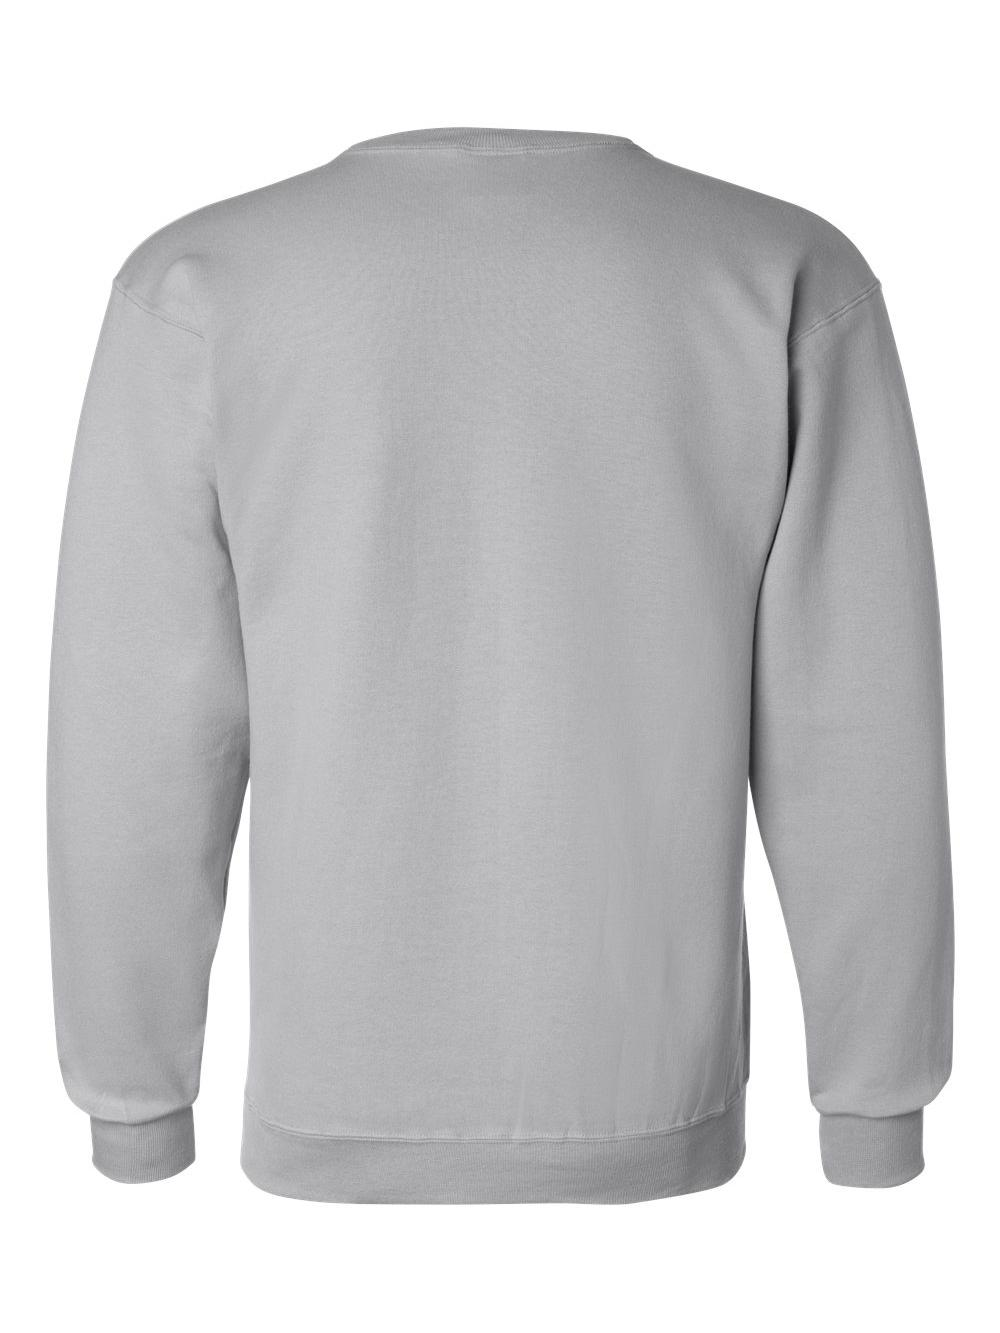 Champion-Double-Dry-Eco-Crewneck-Sweatshirt-S600 thumbnail 10